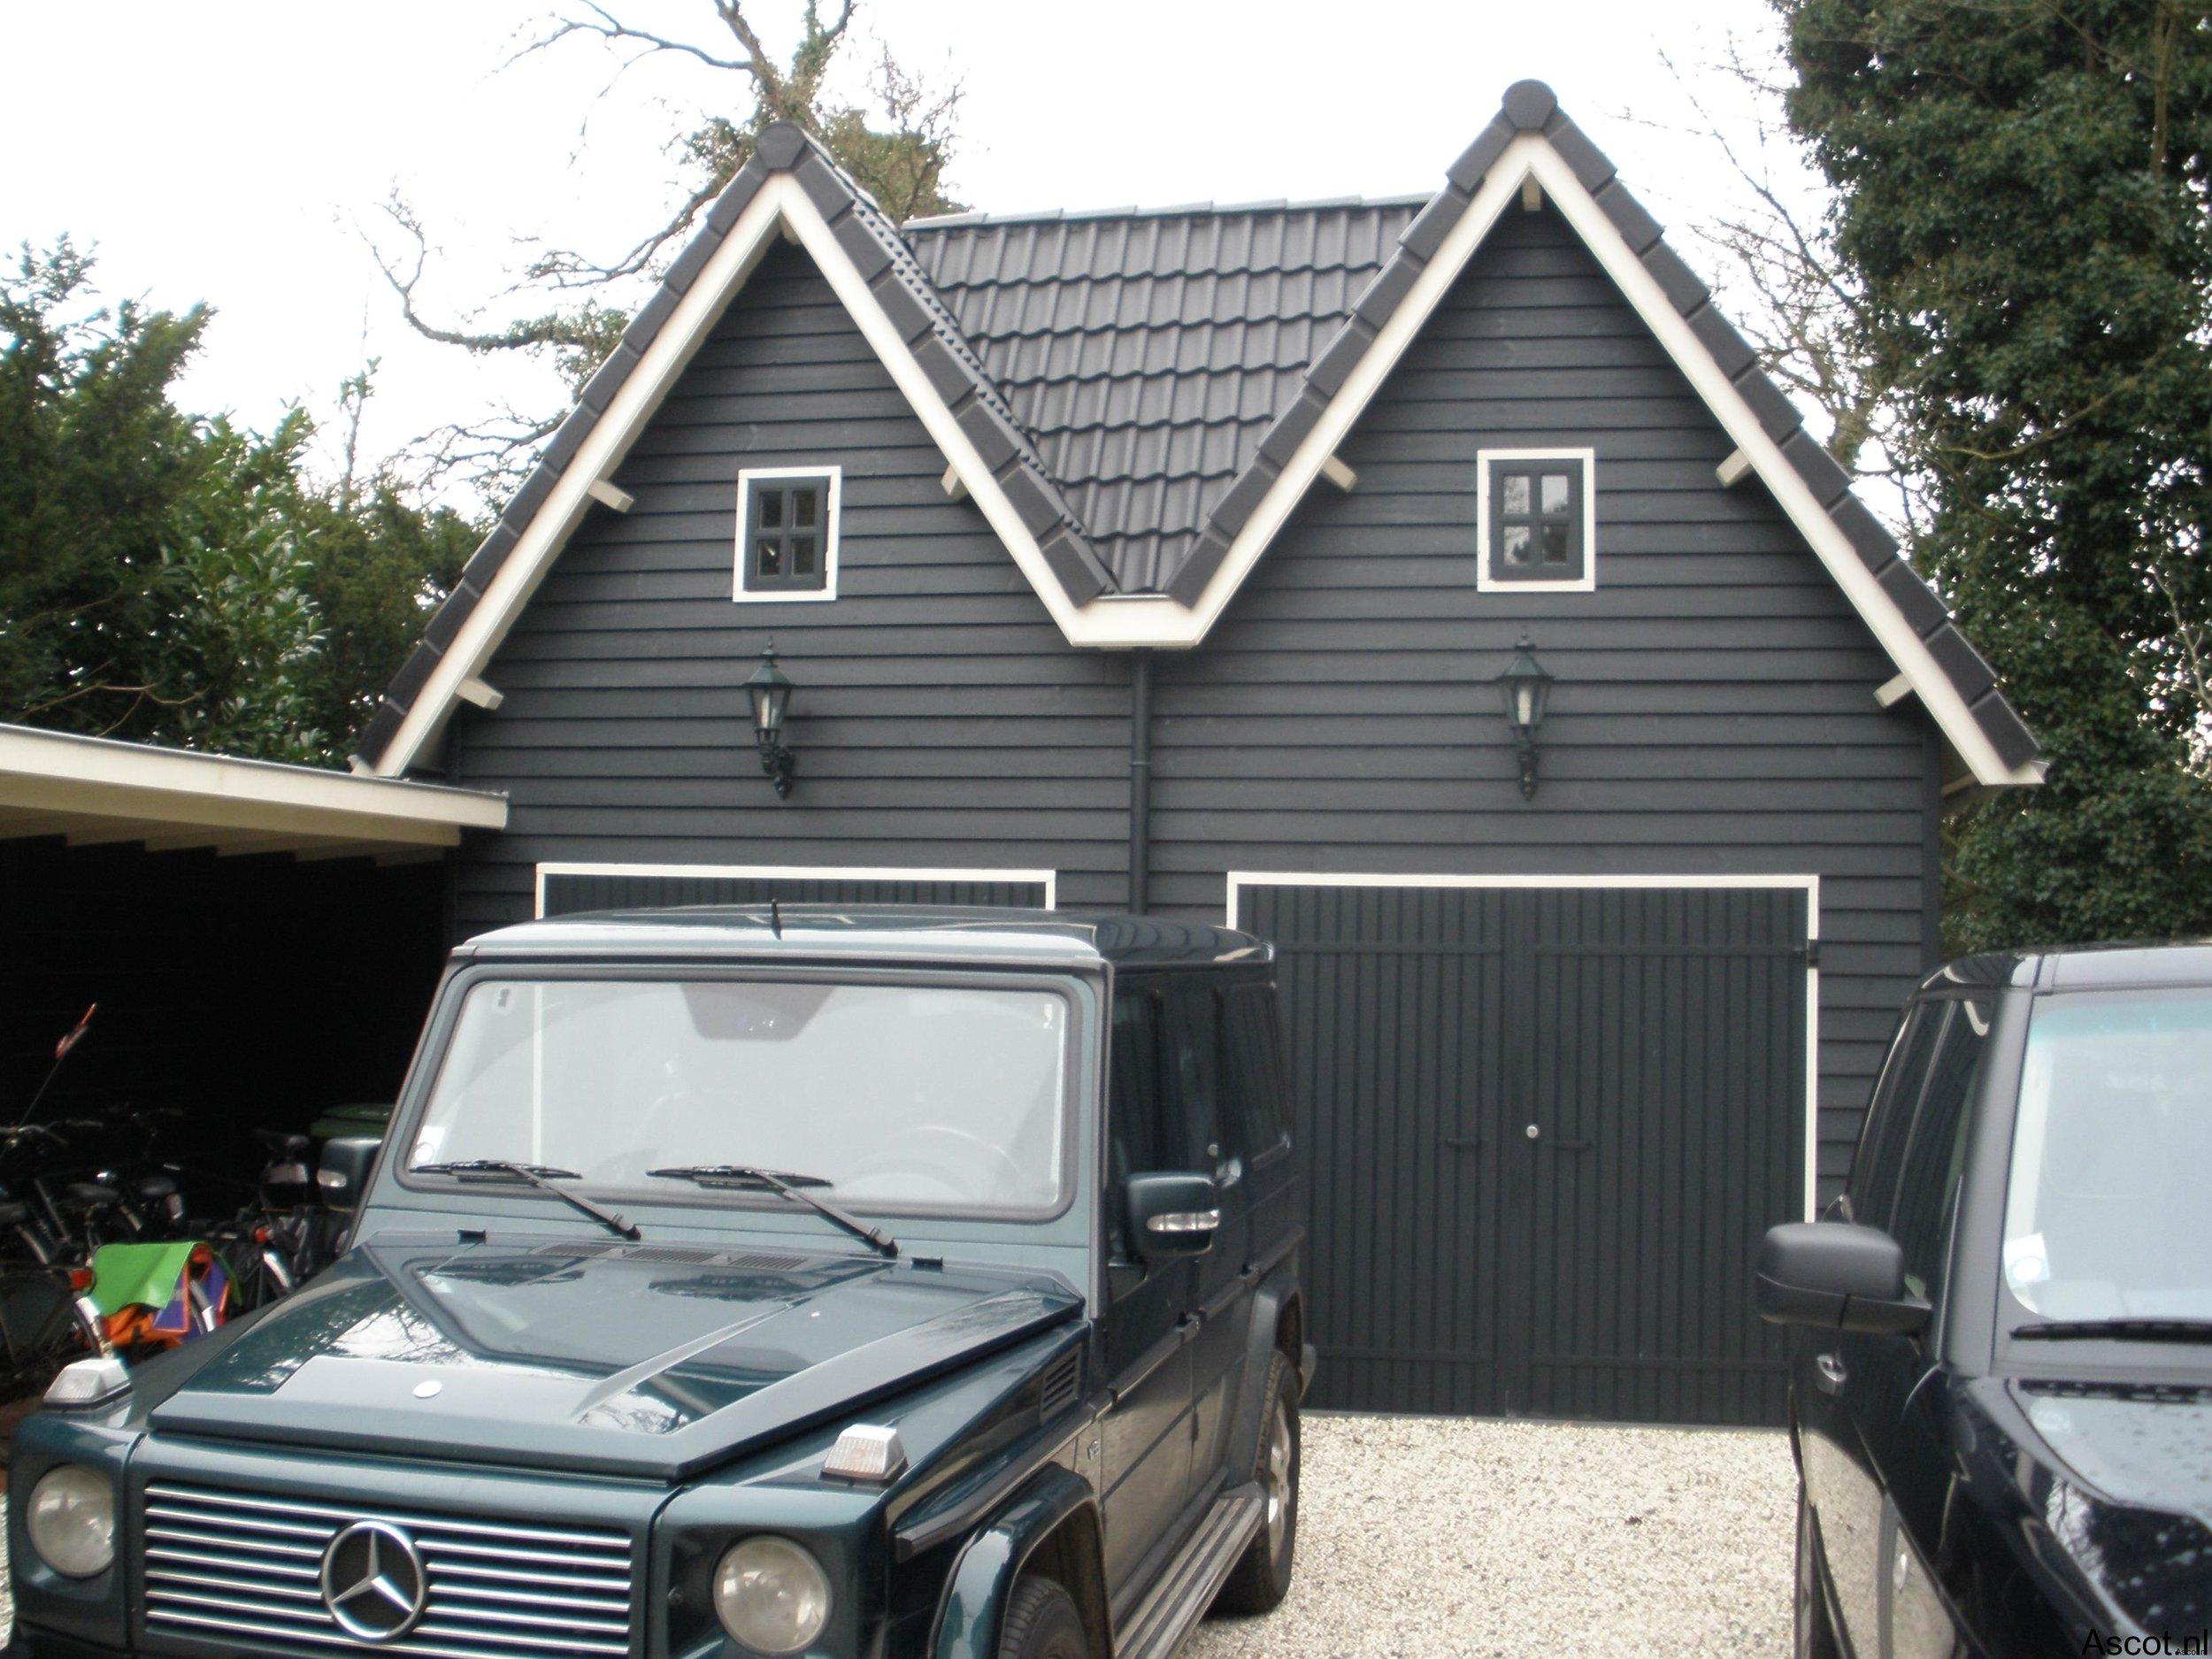 Dubbele garage Ascot Systeembouw